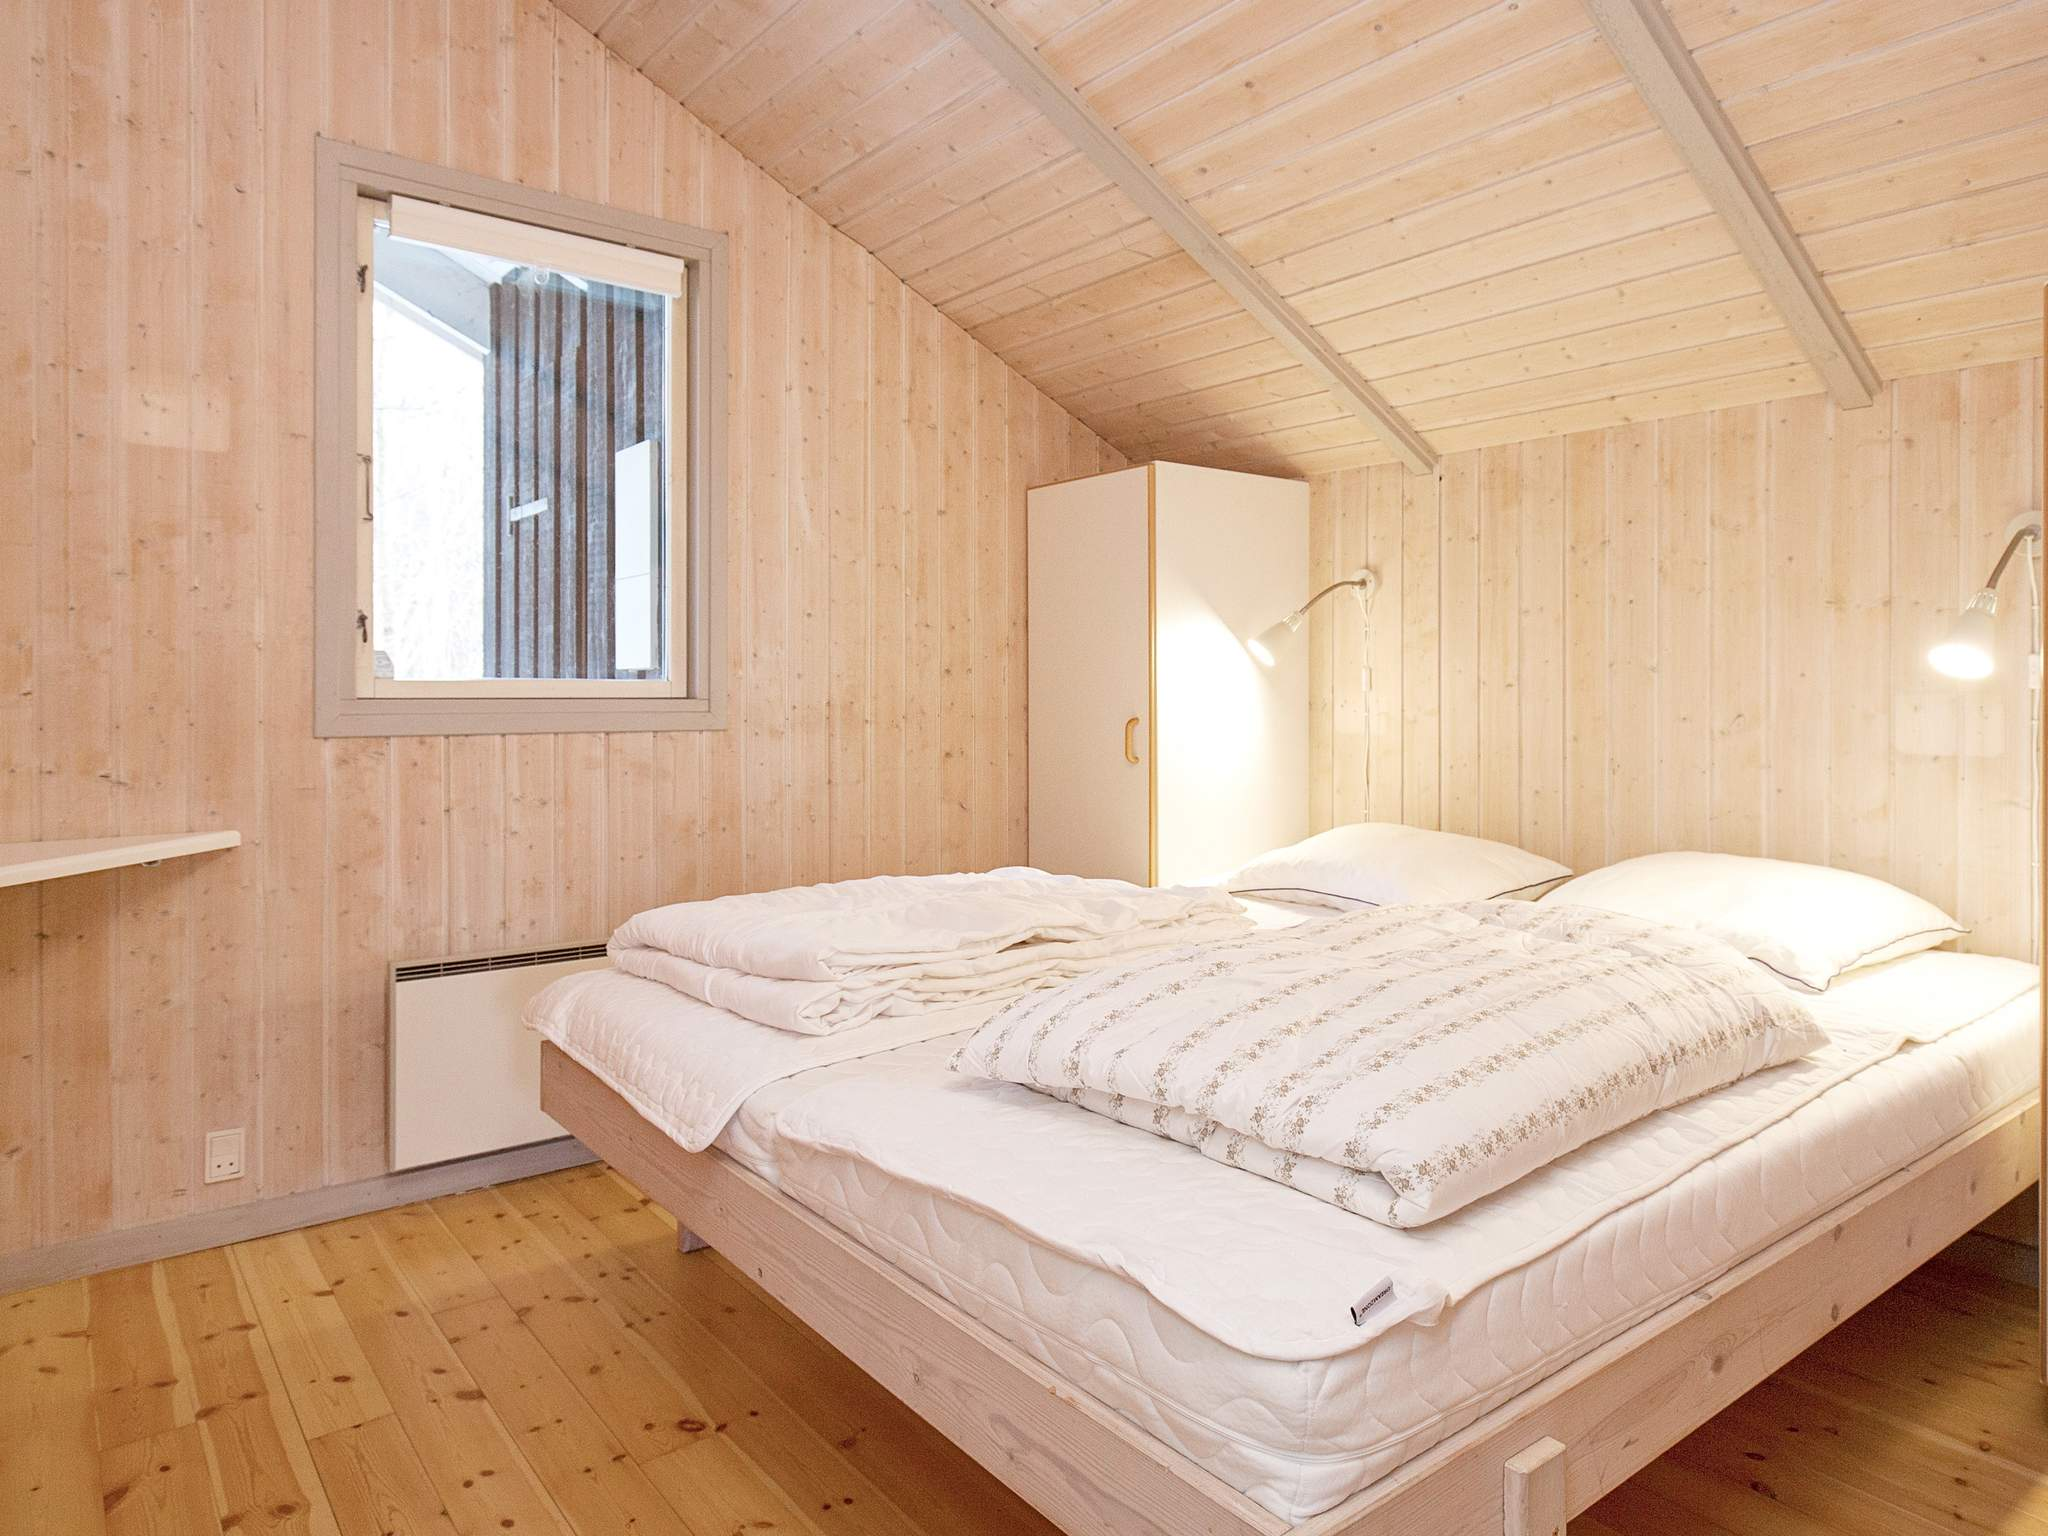 Ferienhaus Melby (83177), Melby, , Nordseeland, Dänemark, Bild 6